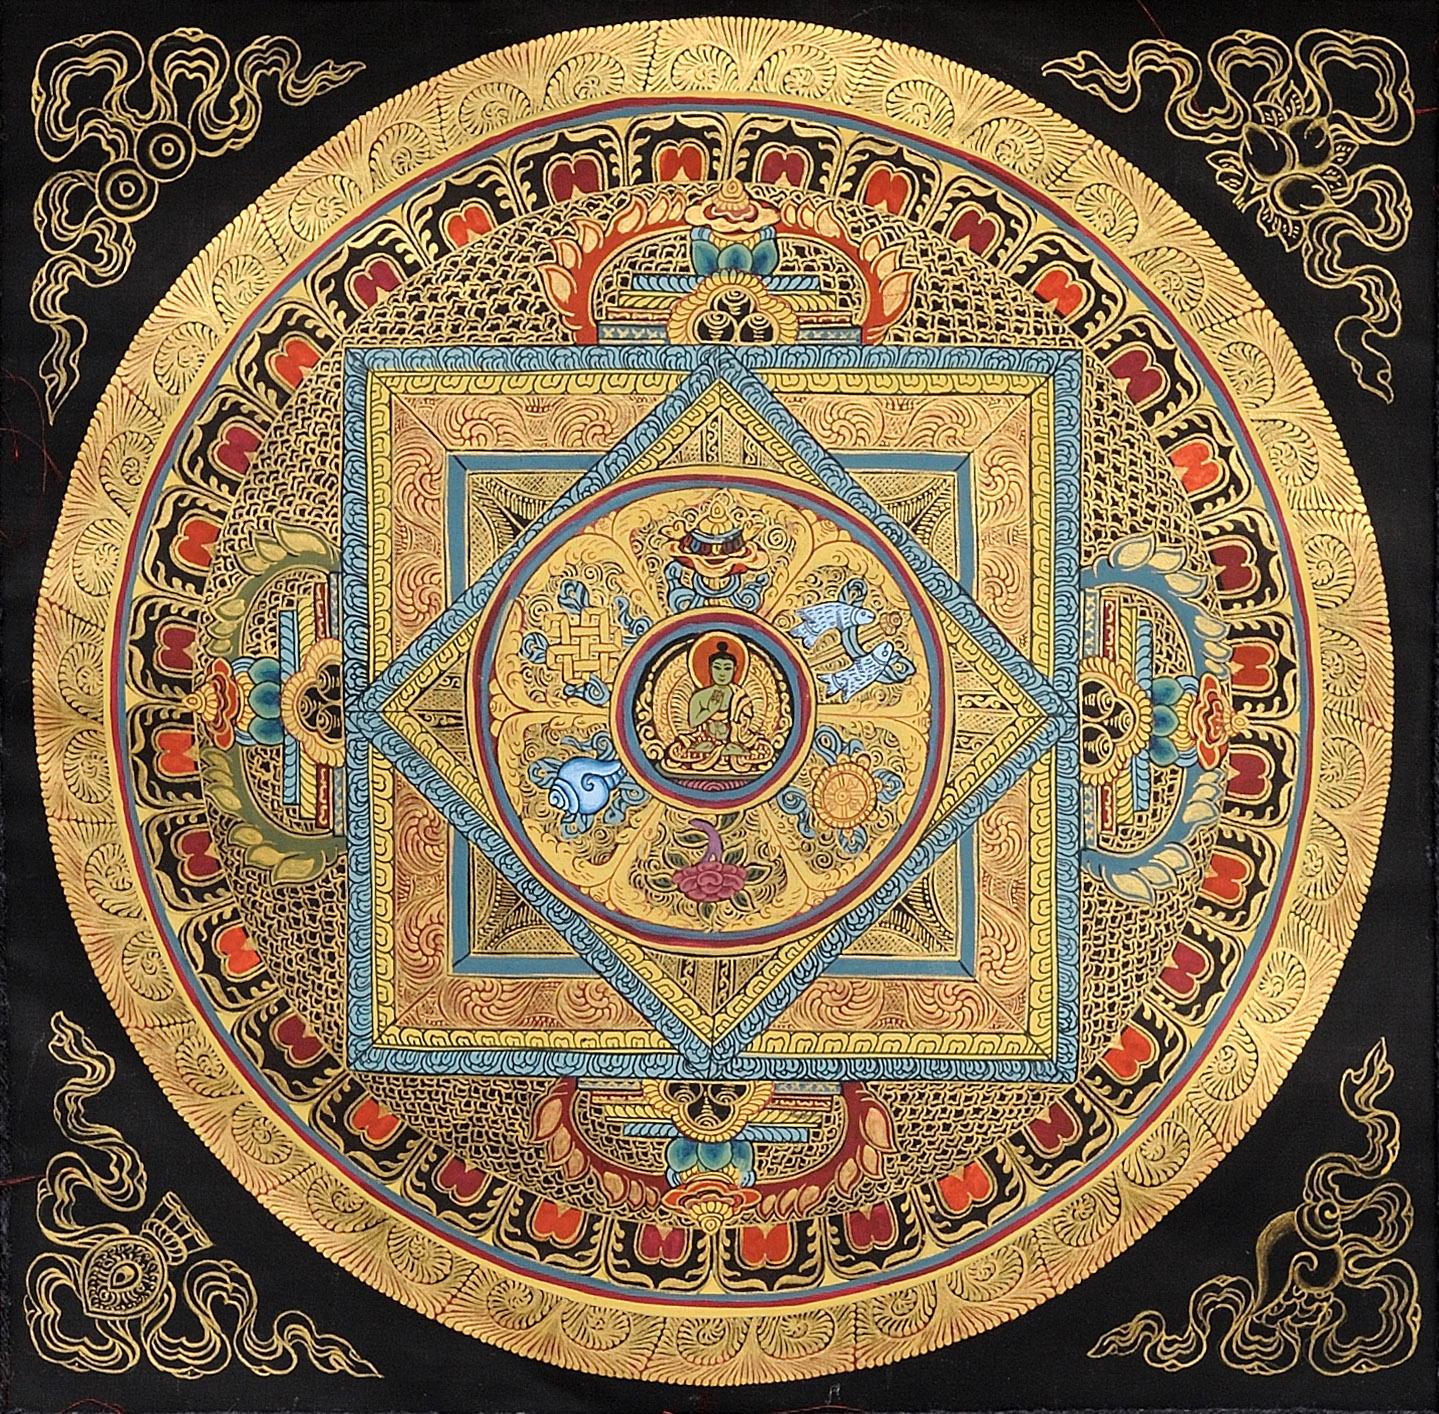 A Mandala Of The Buddha With Auspicious Symbols